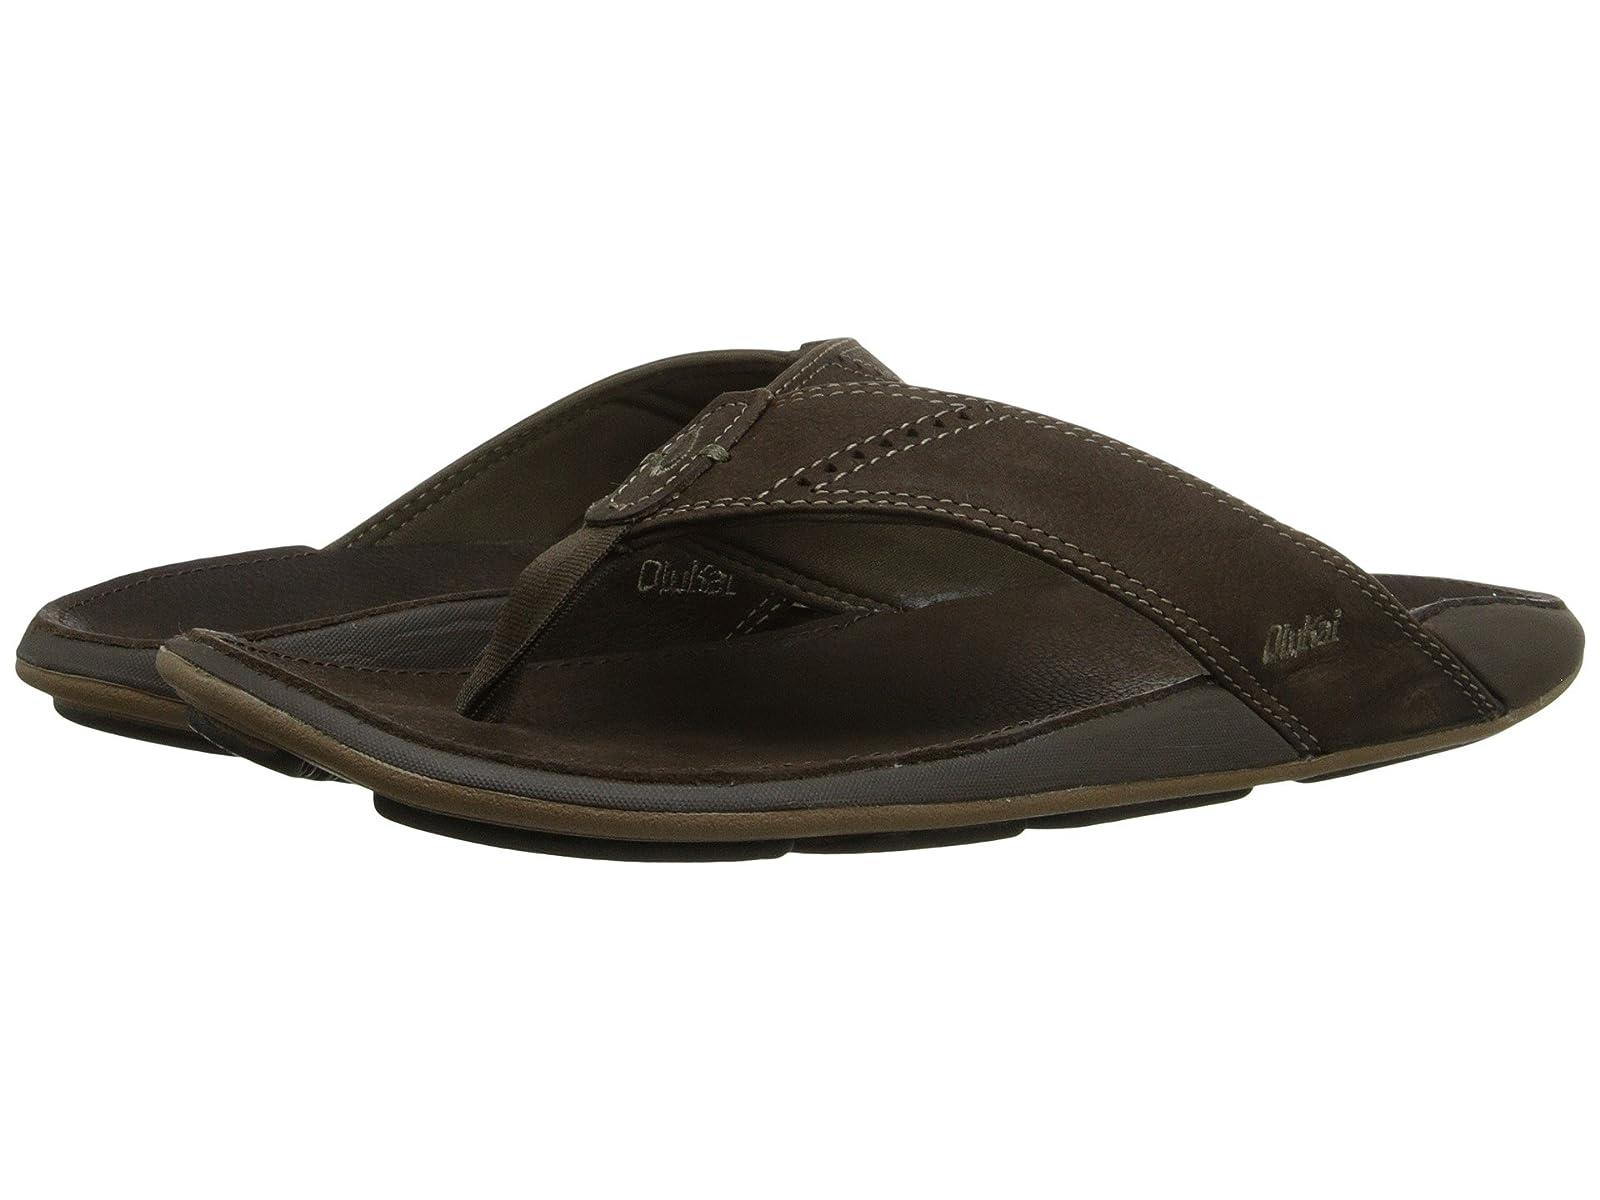 OluKai NuiAtmospheric grades have affordable shoes